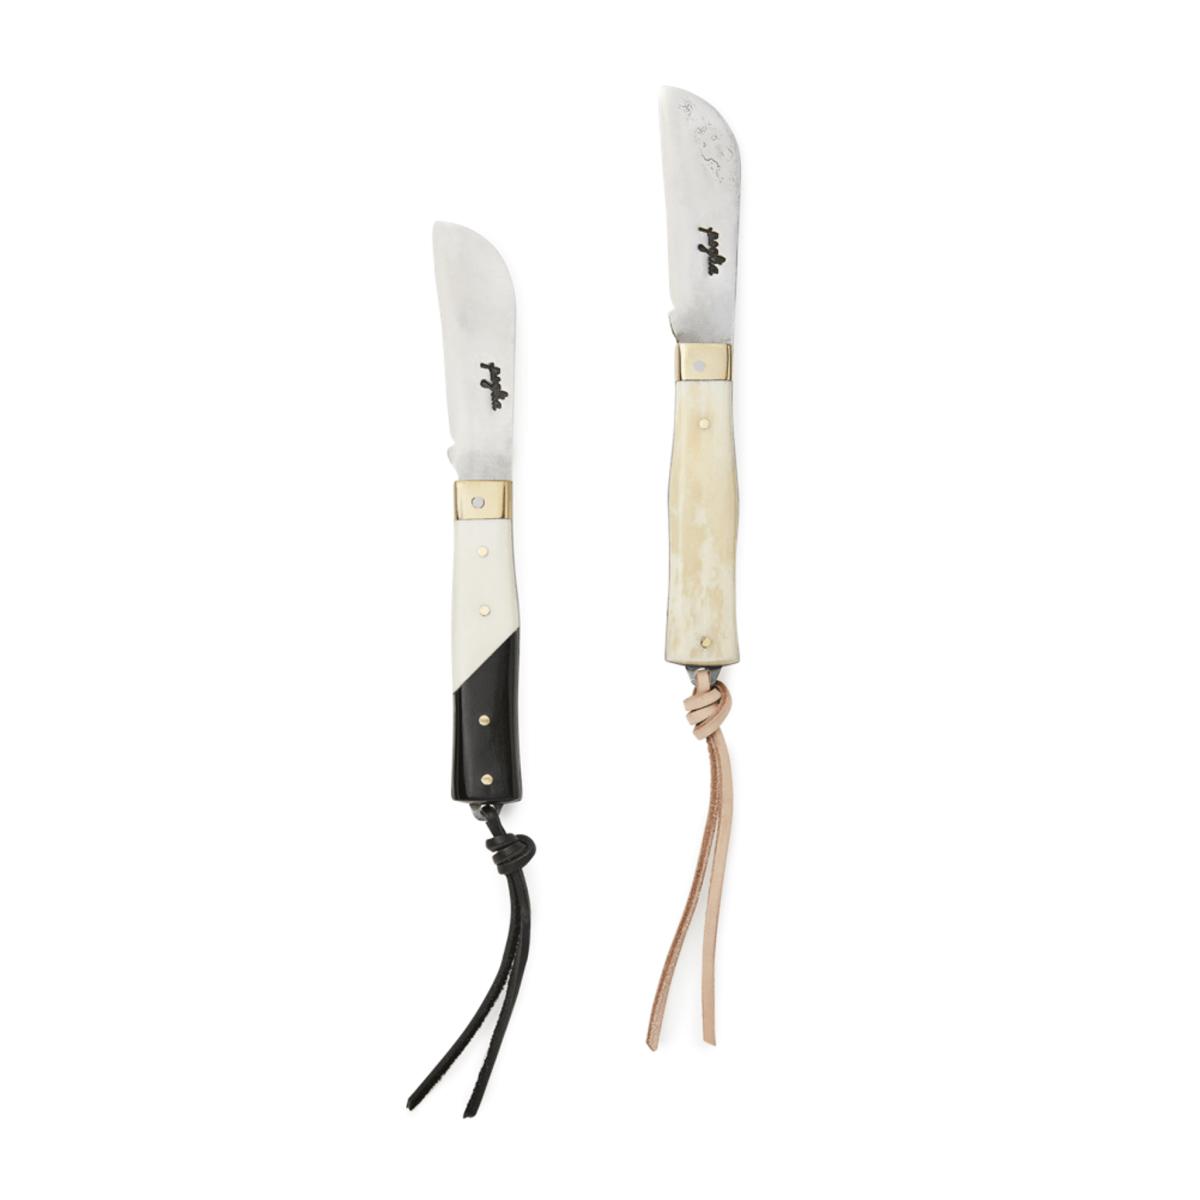 Poglia Classic Pocket Knife